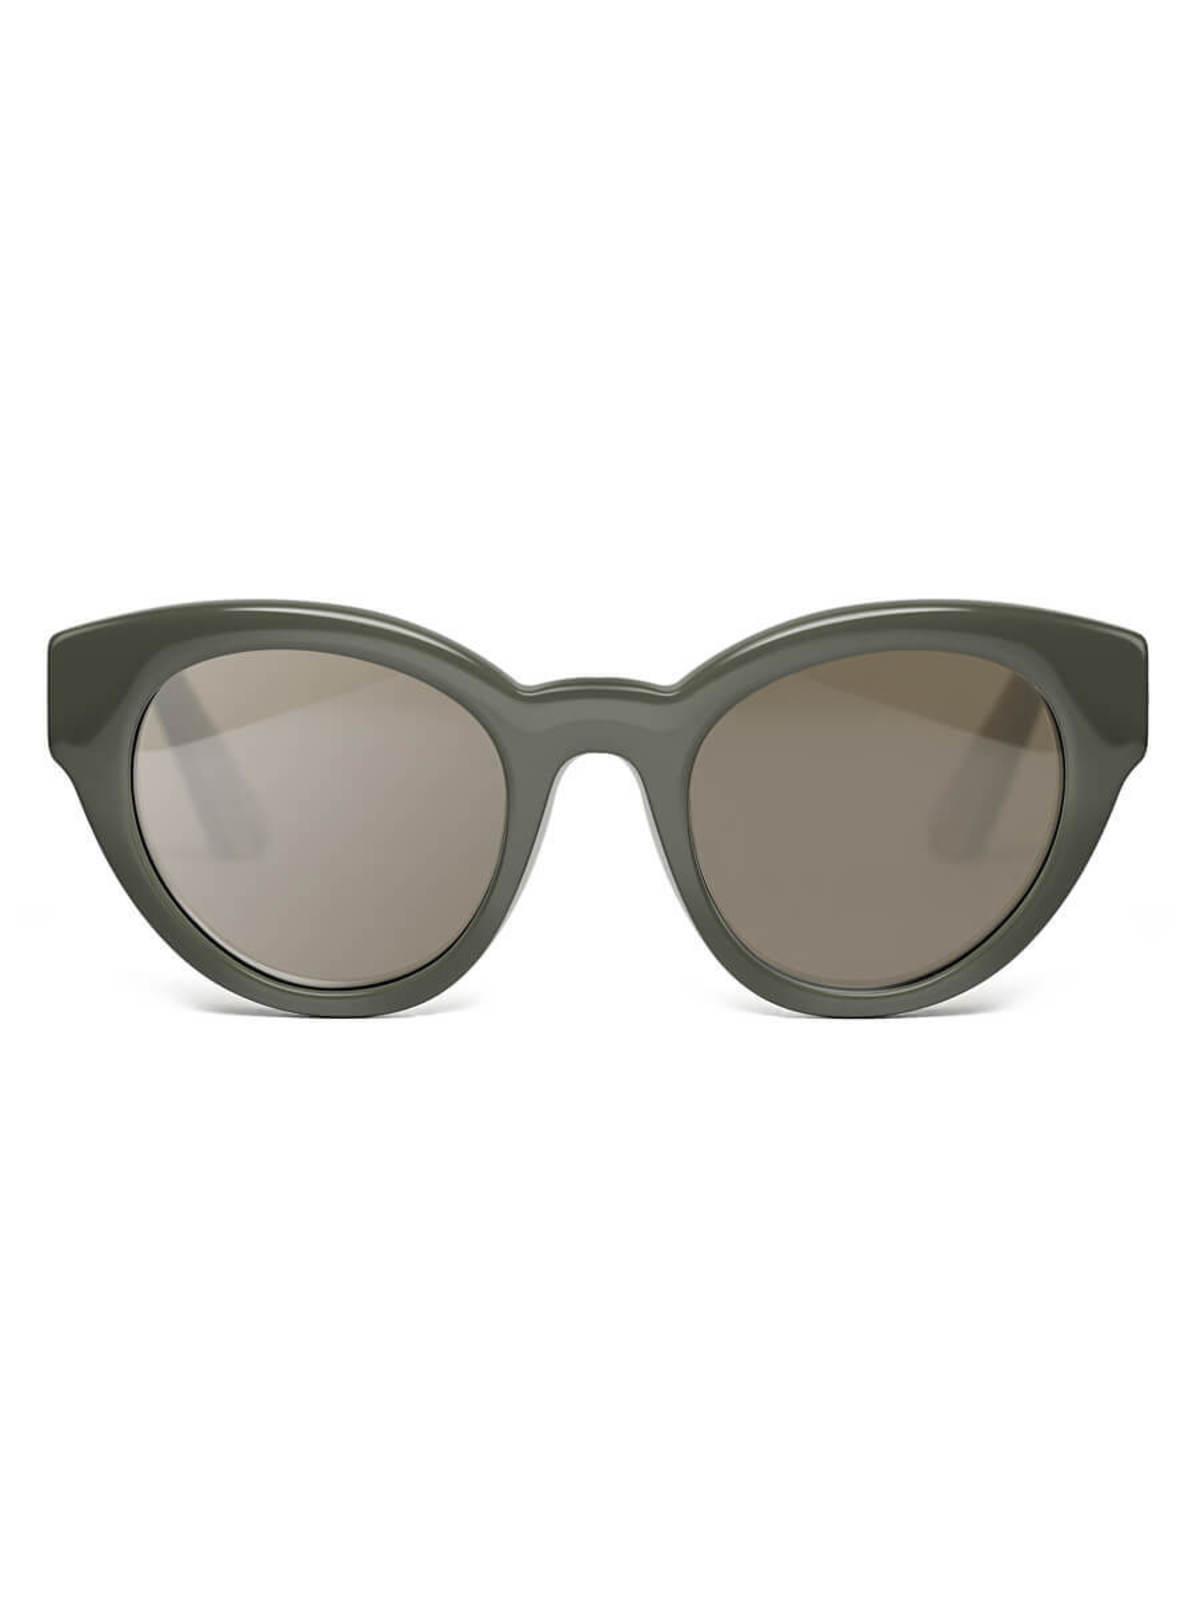 023b7a7d91 Elizabeth and james payton sunglasses khaki garmentory jpg 1200x1600 Elizabeth  james eyewear